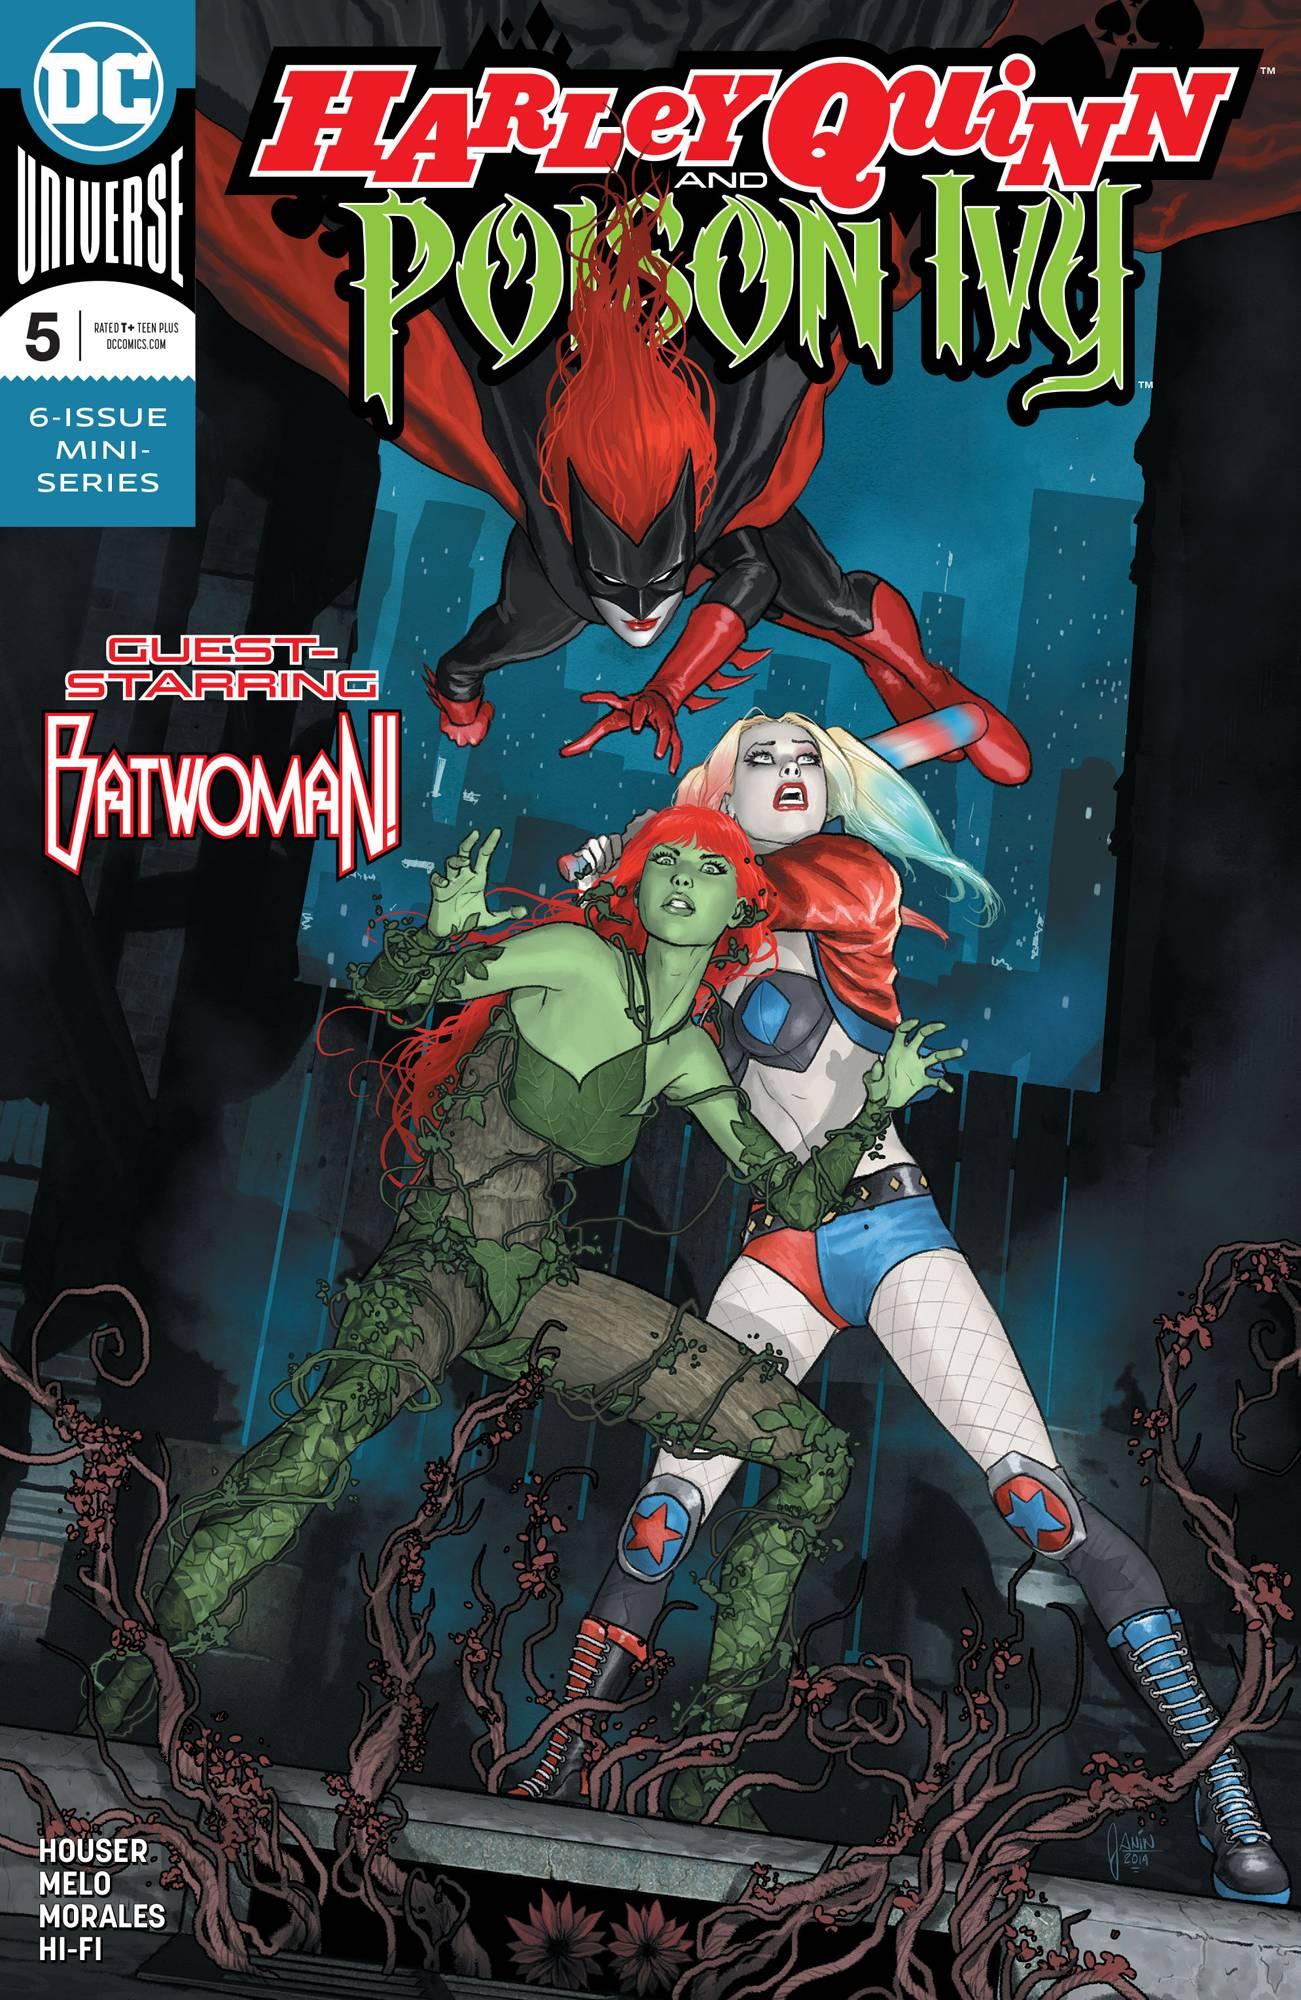 Harley Quinn & Poison Ivy #5 (2020)